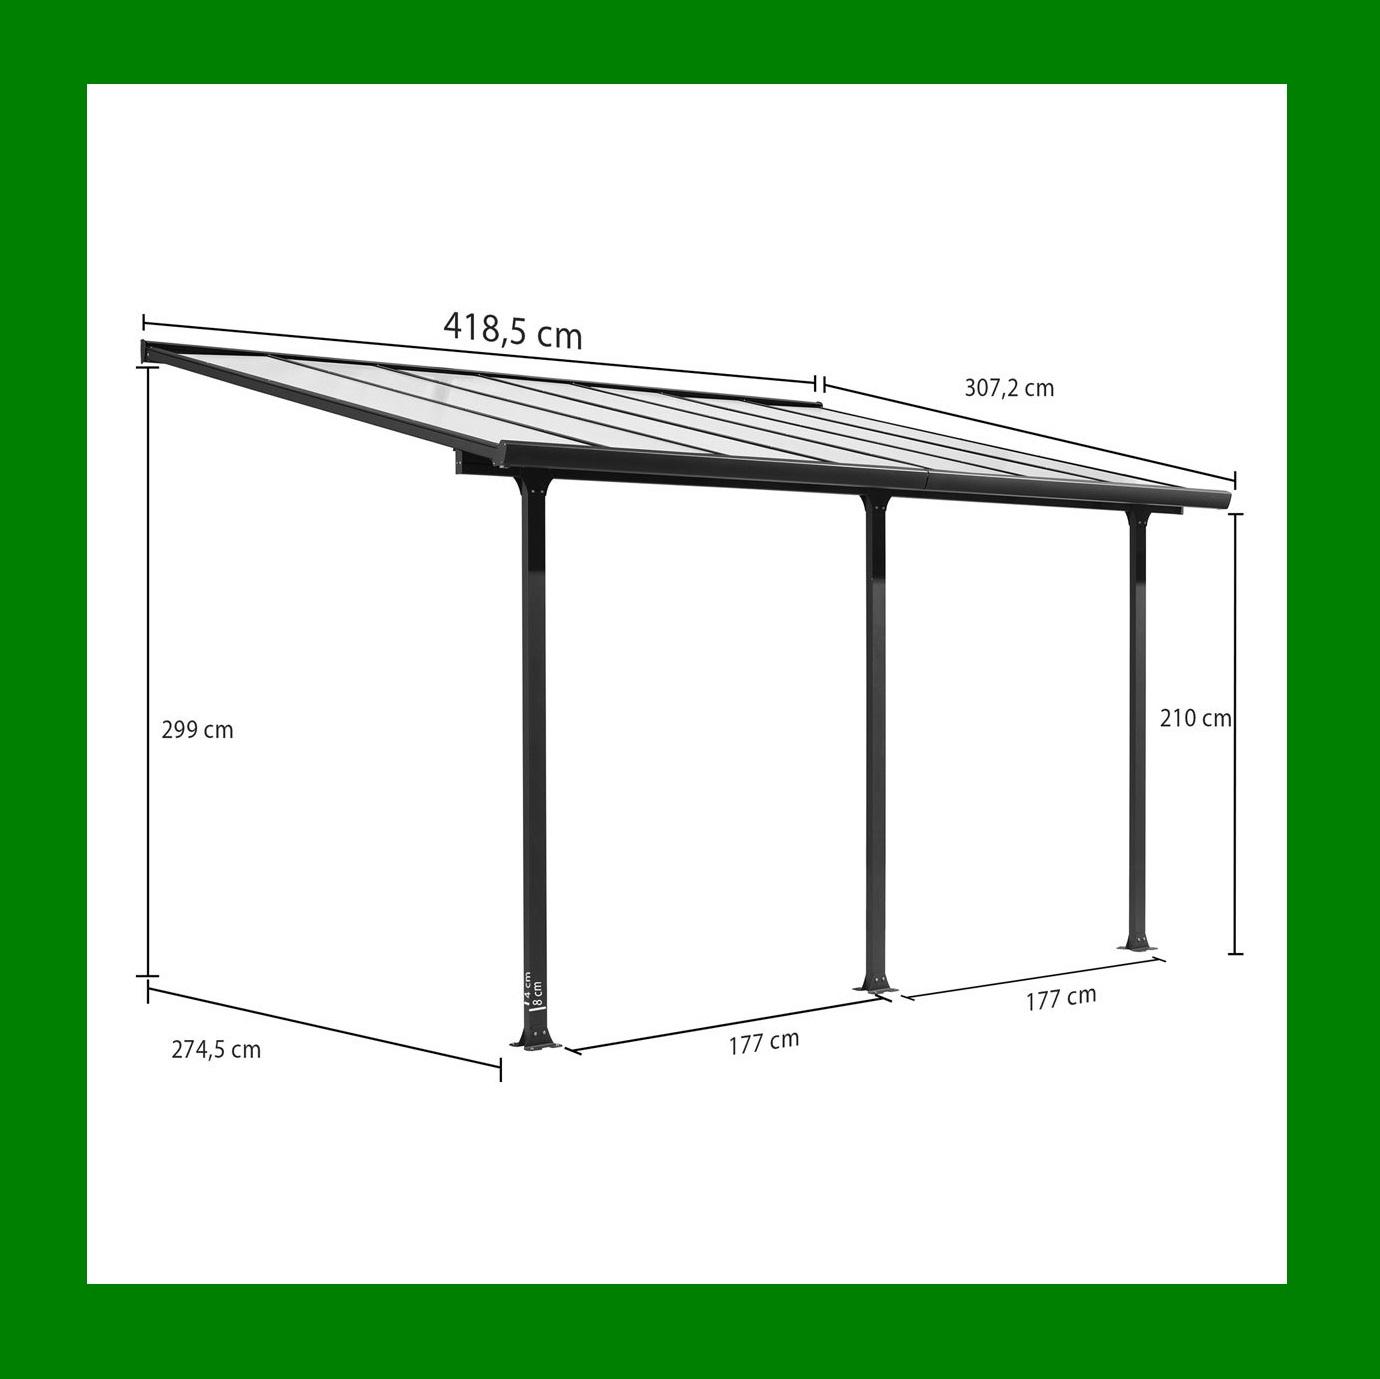 Toit Terrasse Aluminium Carport toit Terrasse En Aluminium 4x3 M Abrirama Tt3042al